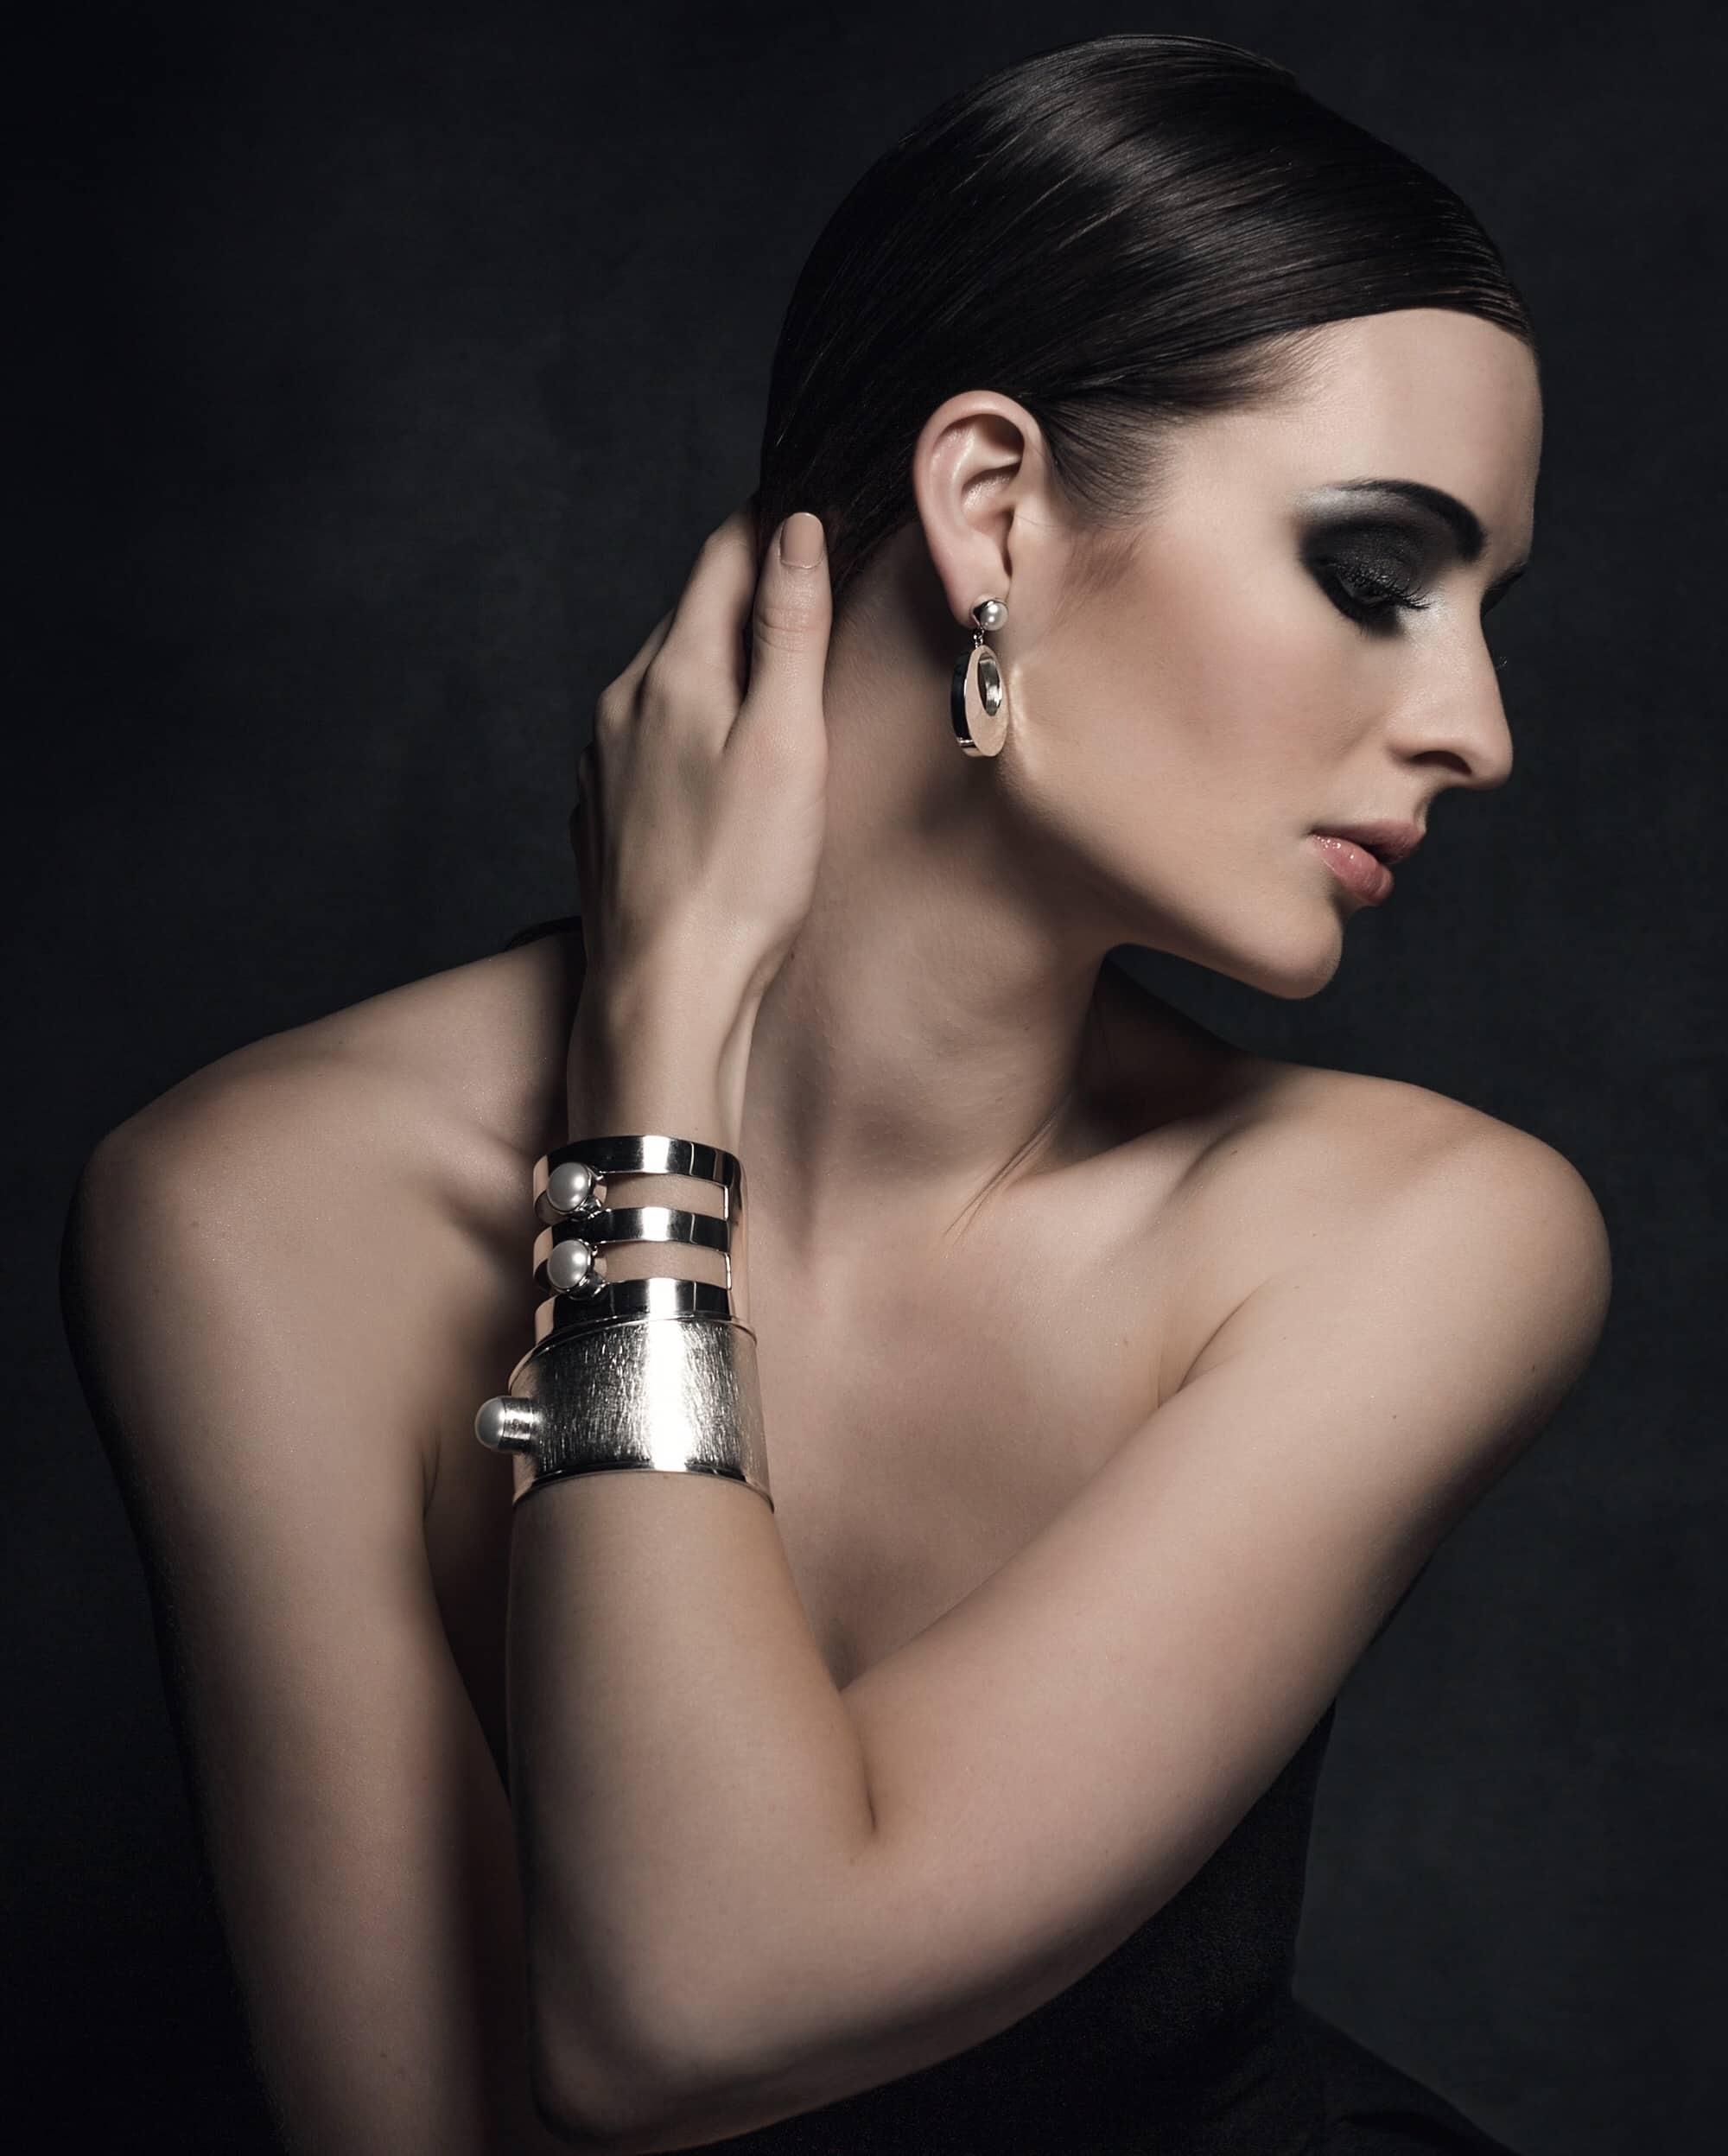 Monica Zamora